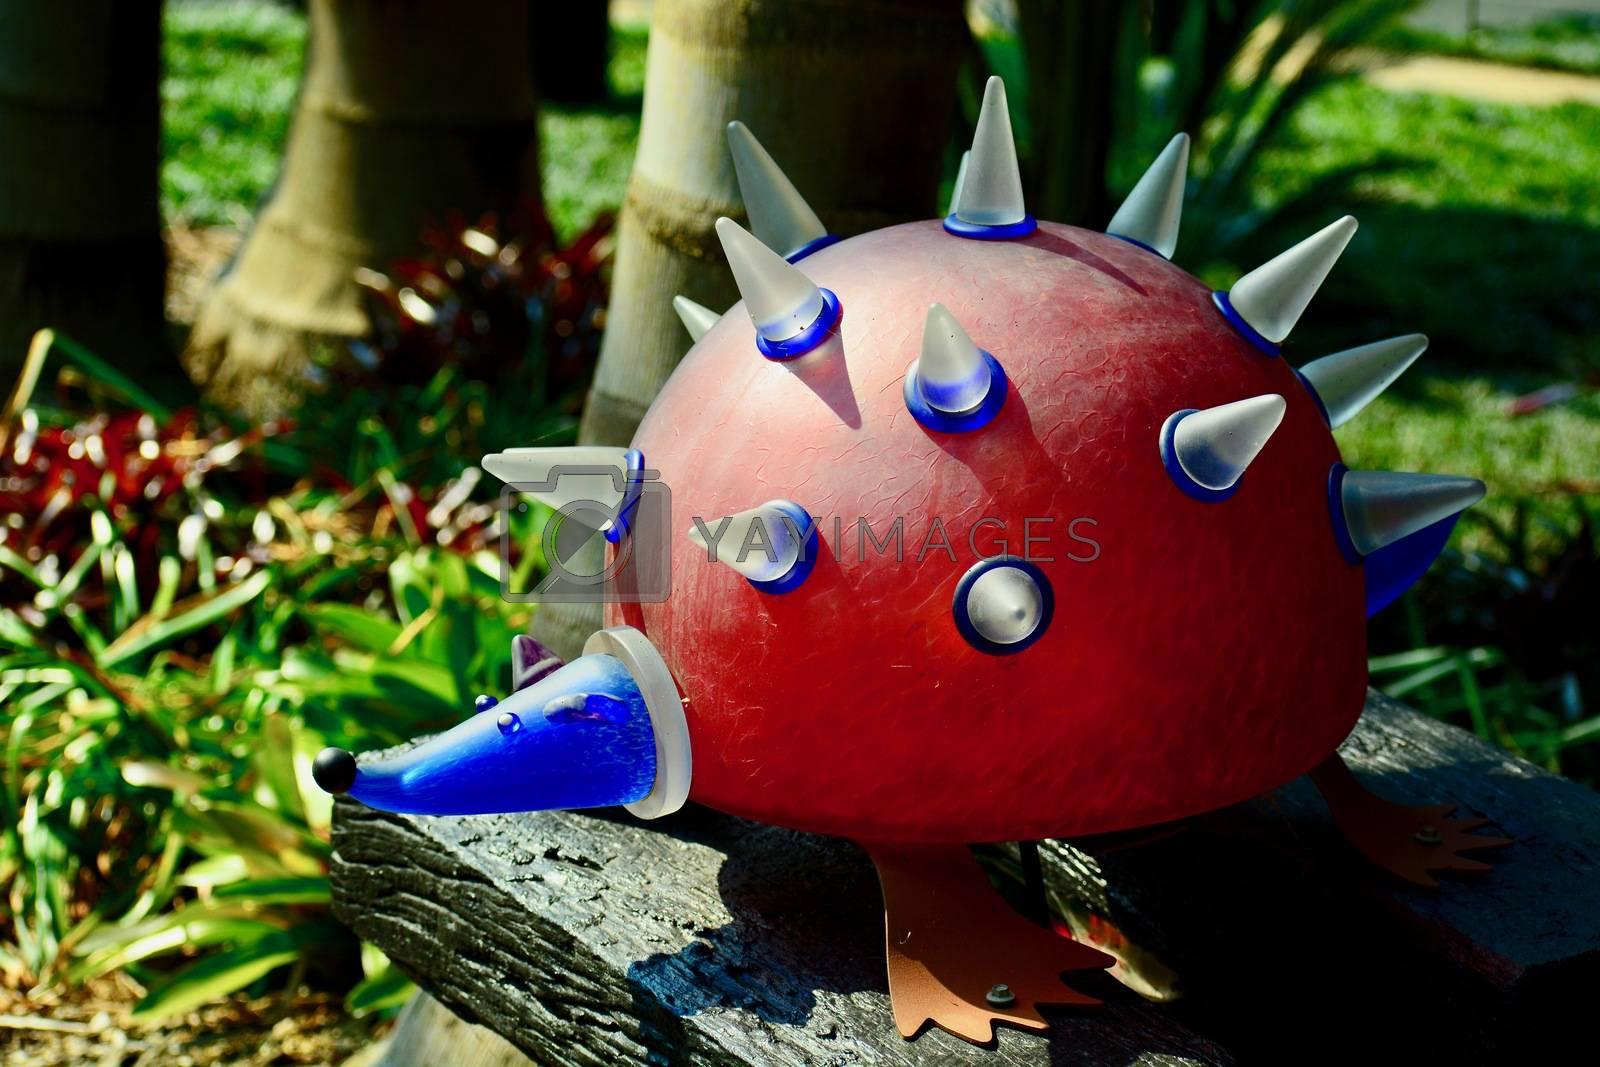 Funny garden sculpture representing a hedgehog.